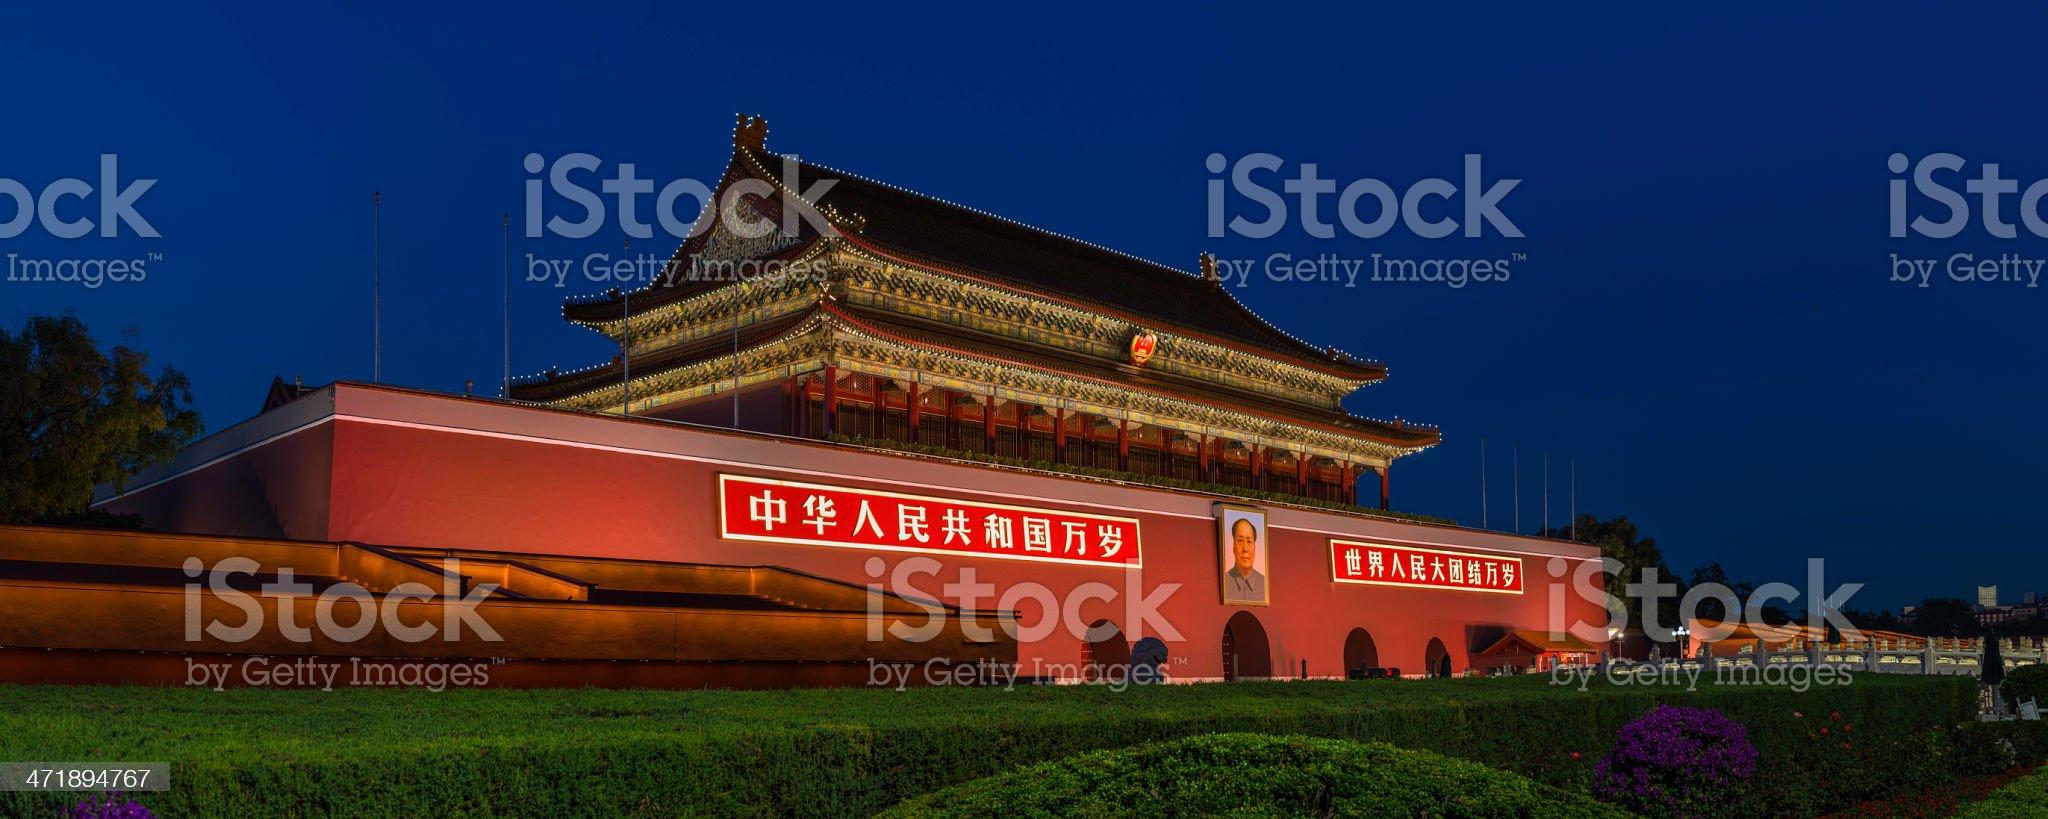 Beijing Tiananmen Square Gate Forbidden City iconic landmark panorama China royalty-free stock photo